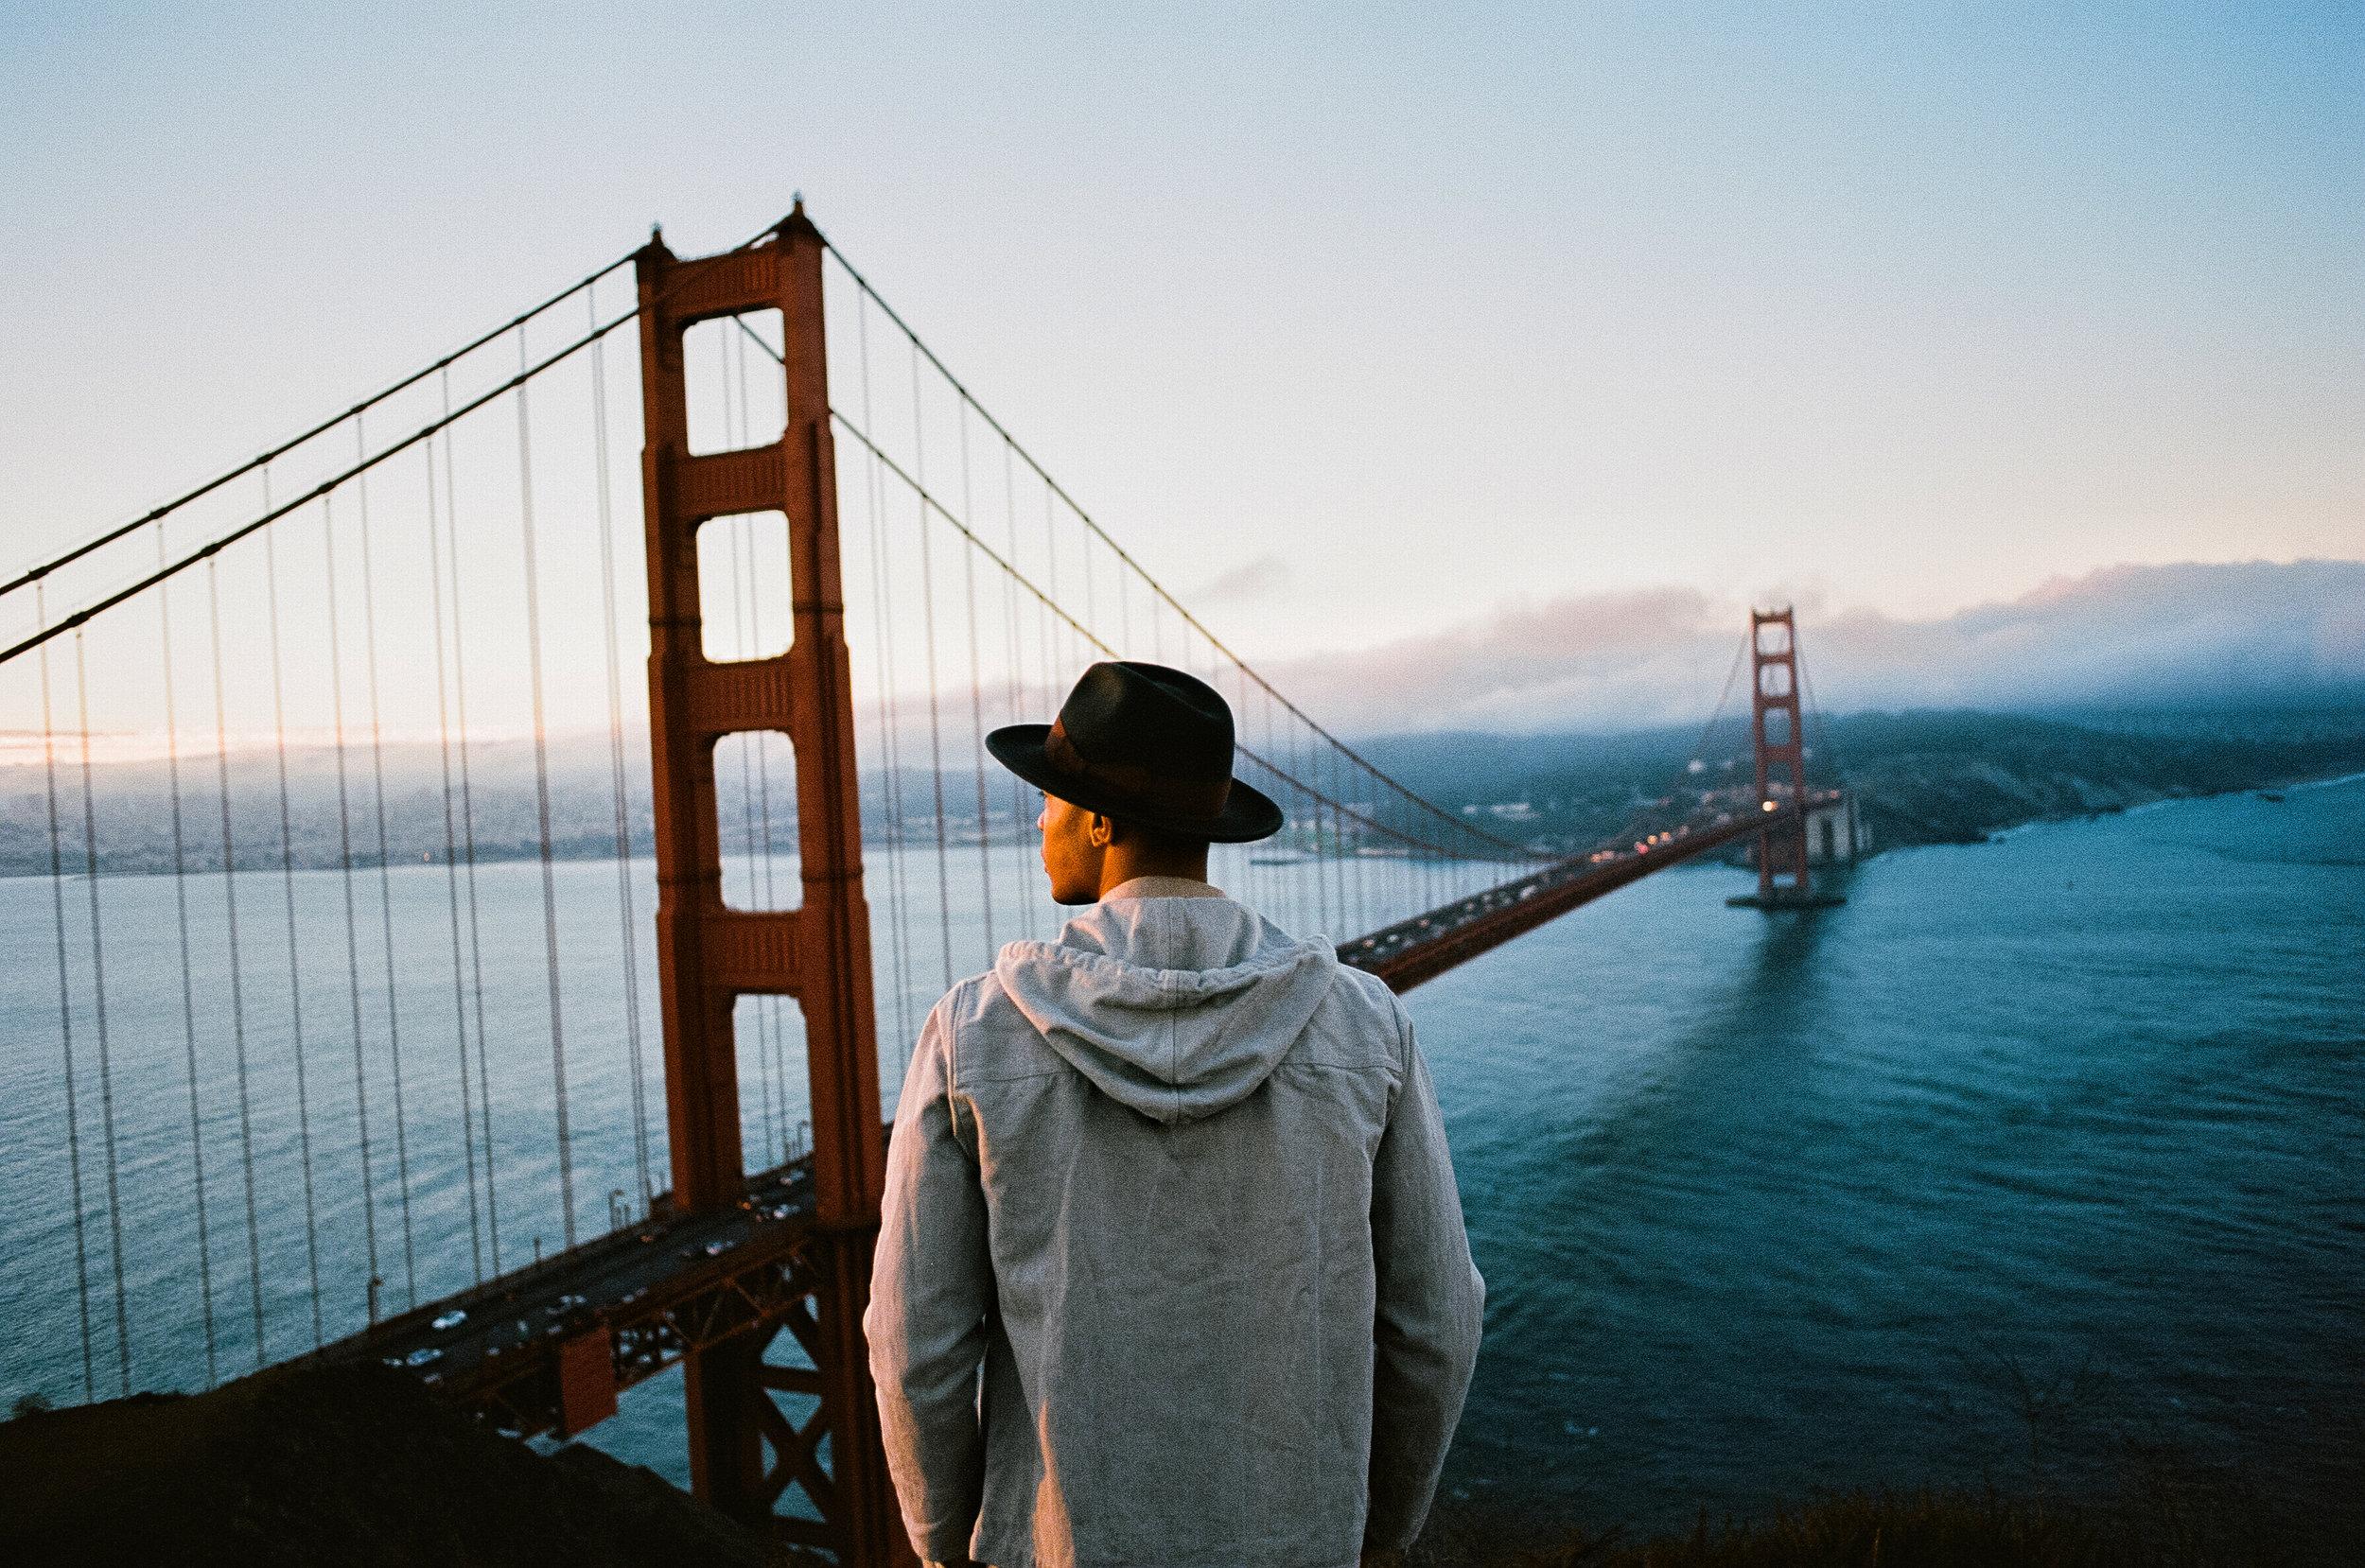 alex_crane_bight_jacket_golden_gate_bridge